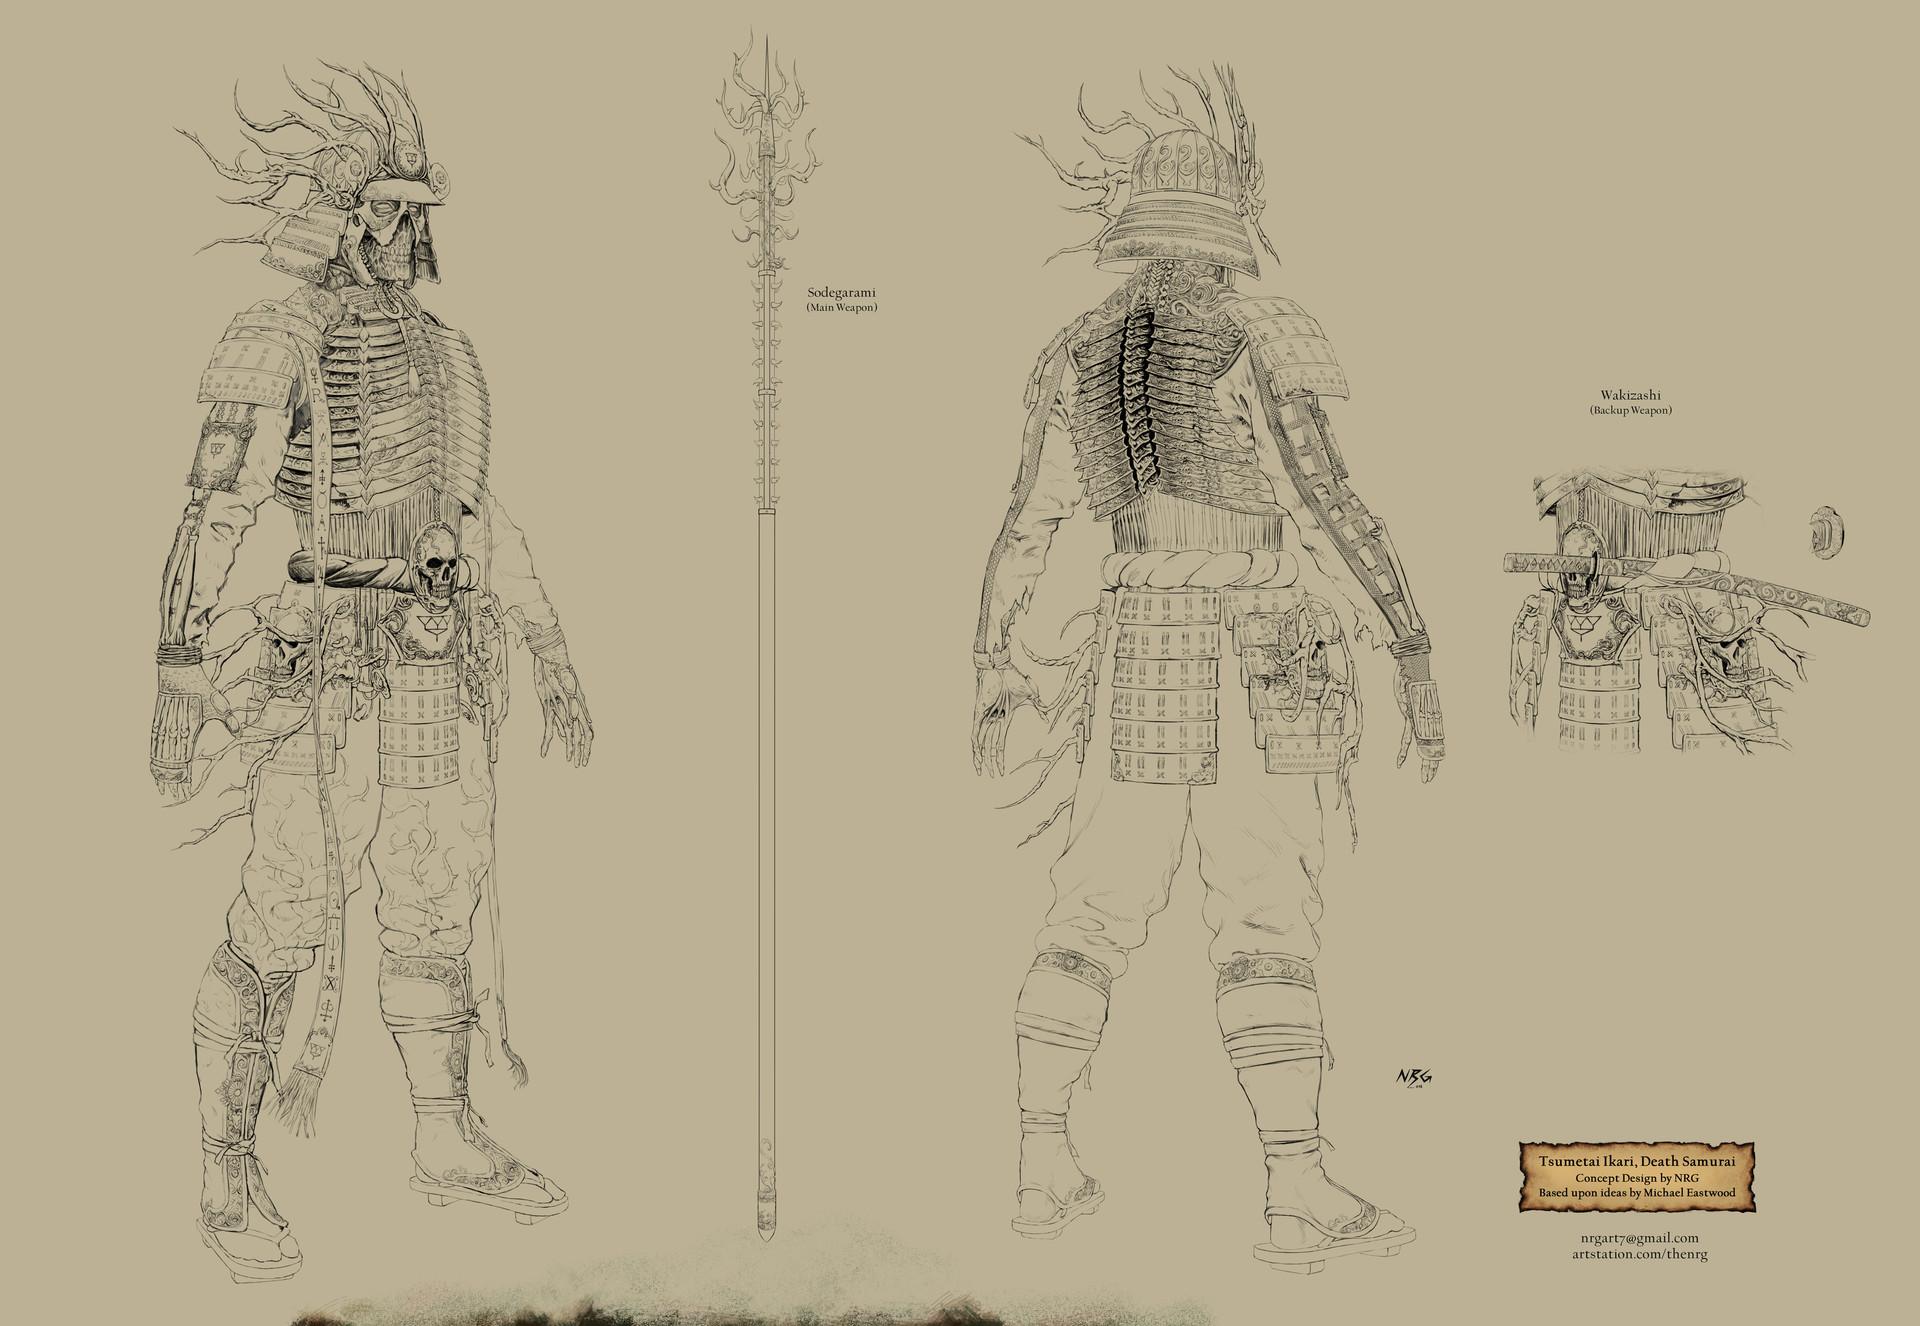 The nrg tsumetai ikari death samurai statue concept design final lineart by nrg web